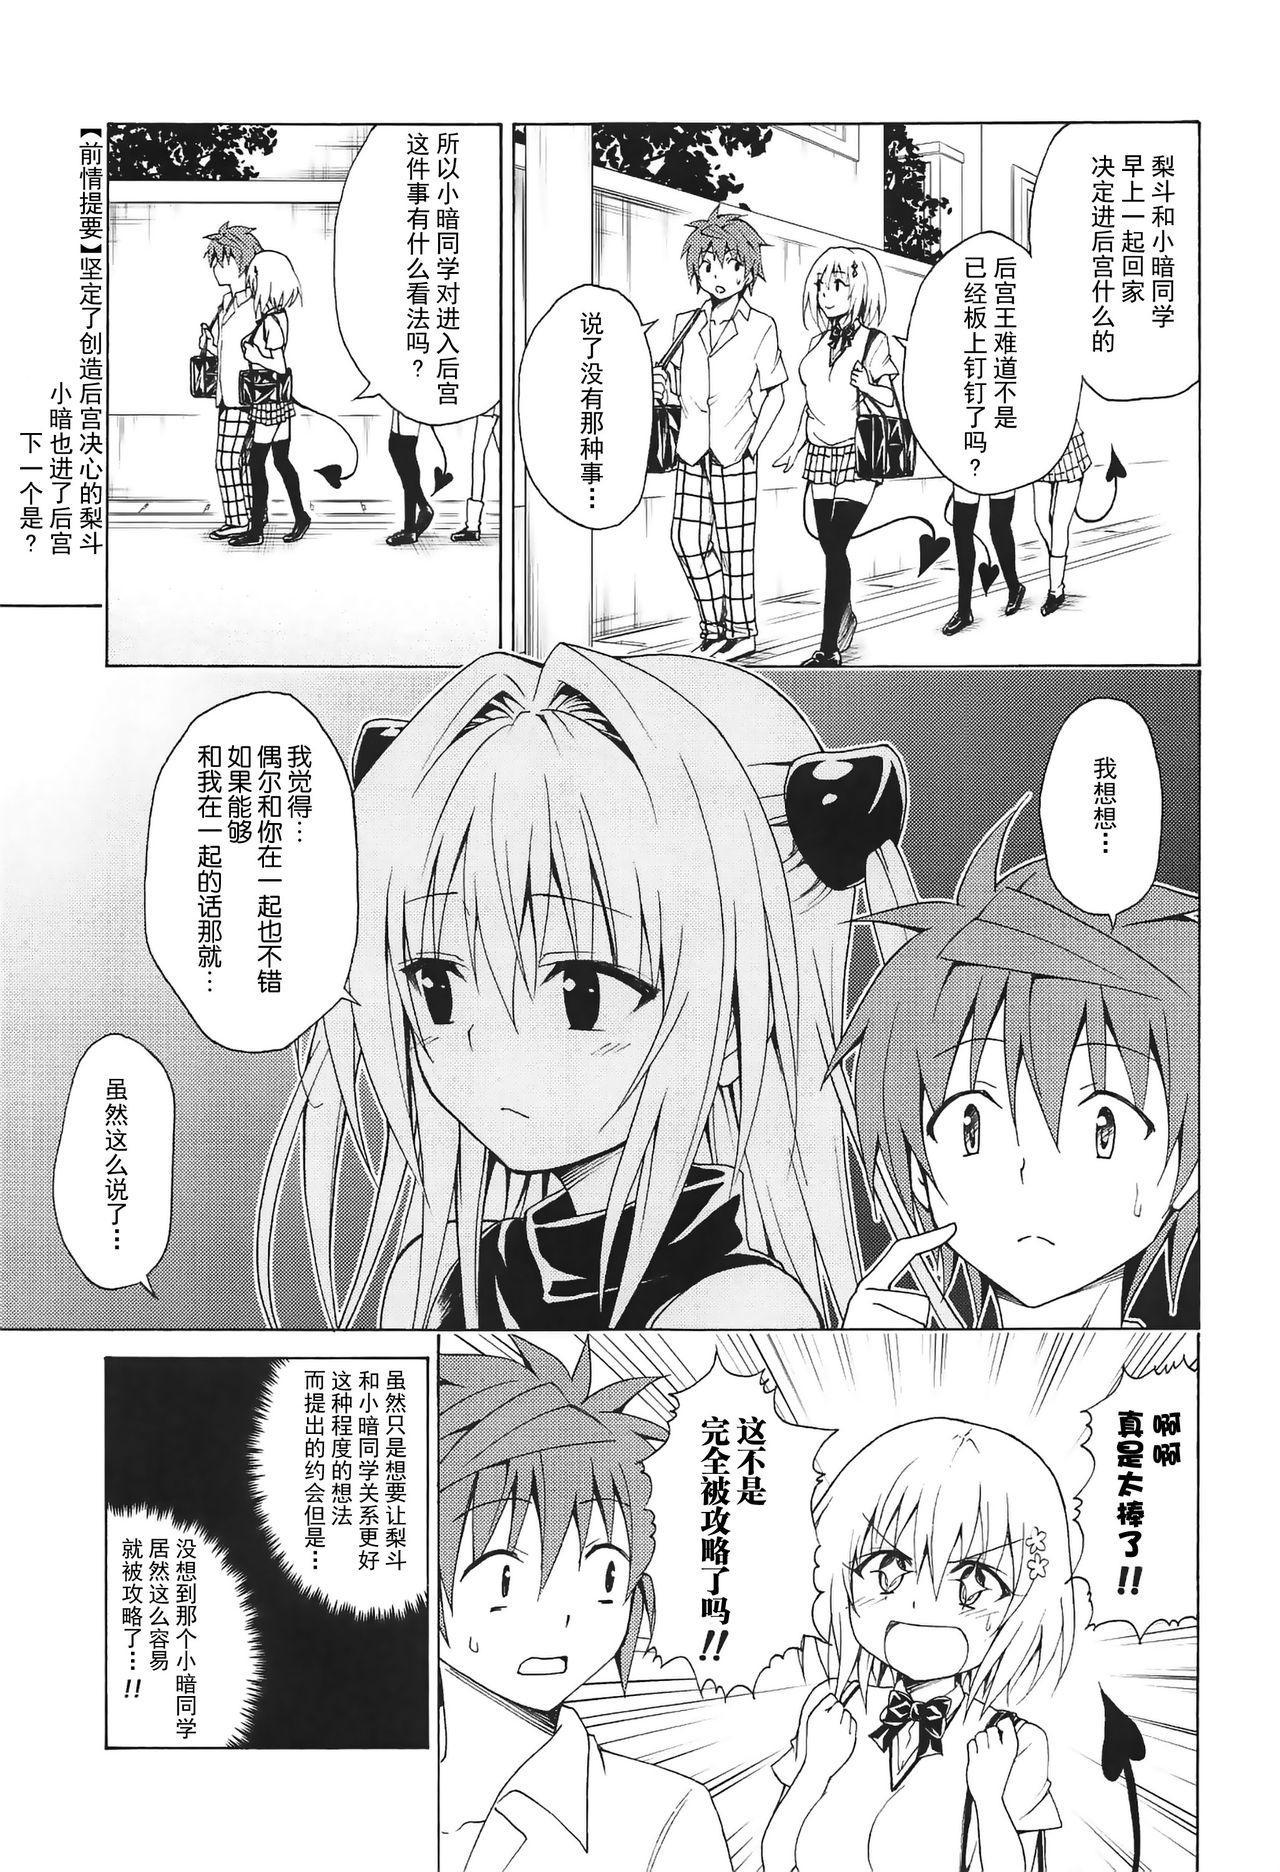 Mezase! Rakuen Keikaku Vol. 5 2